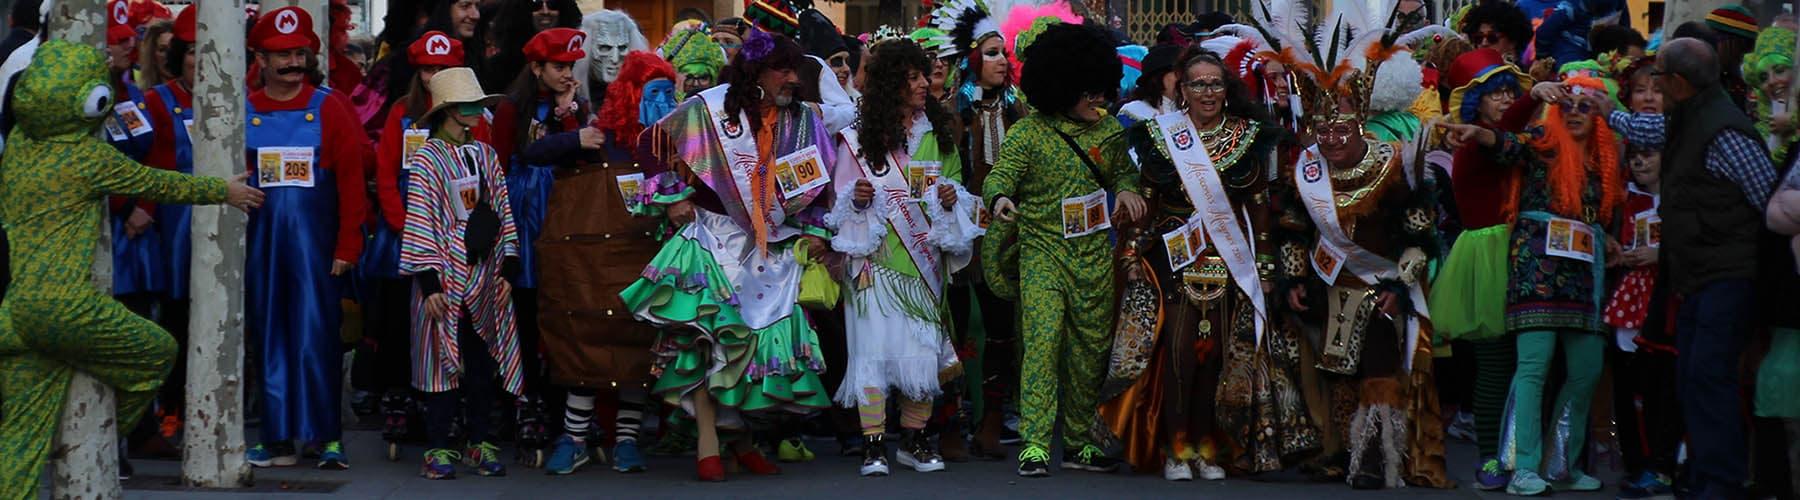 carnaval-miguelturra-carrera-mascaras